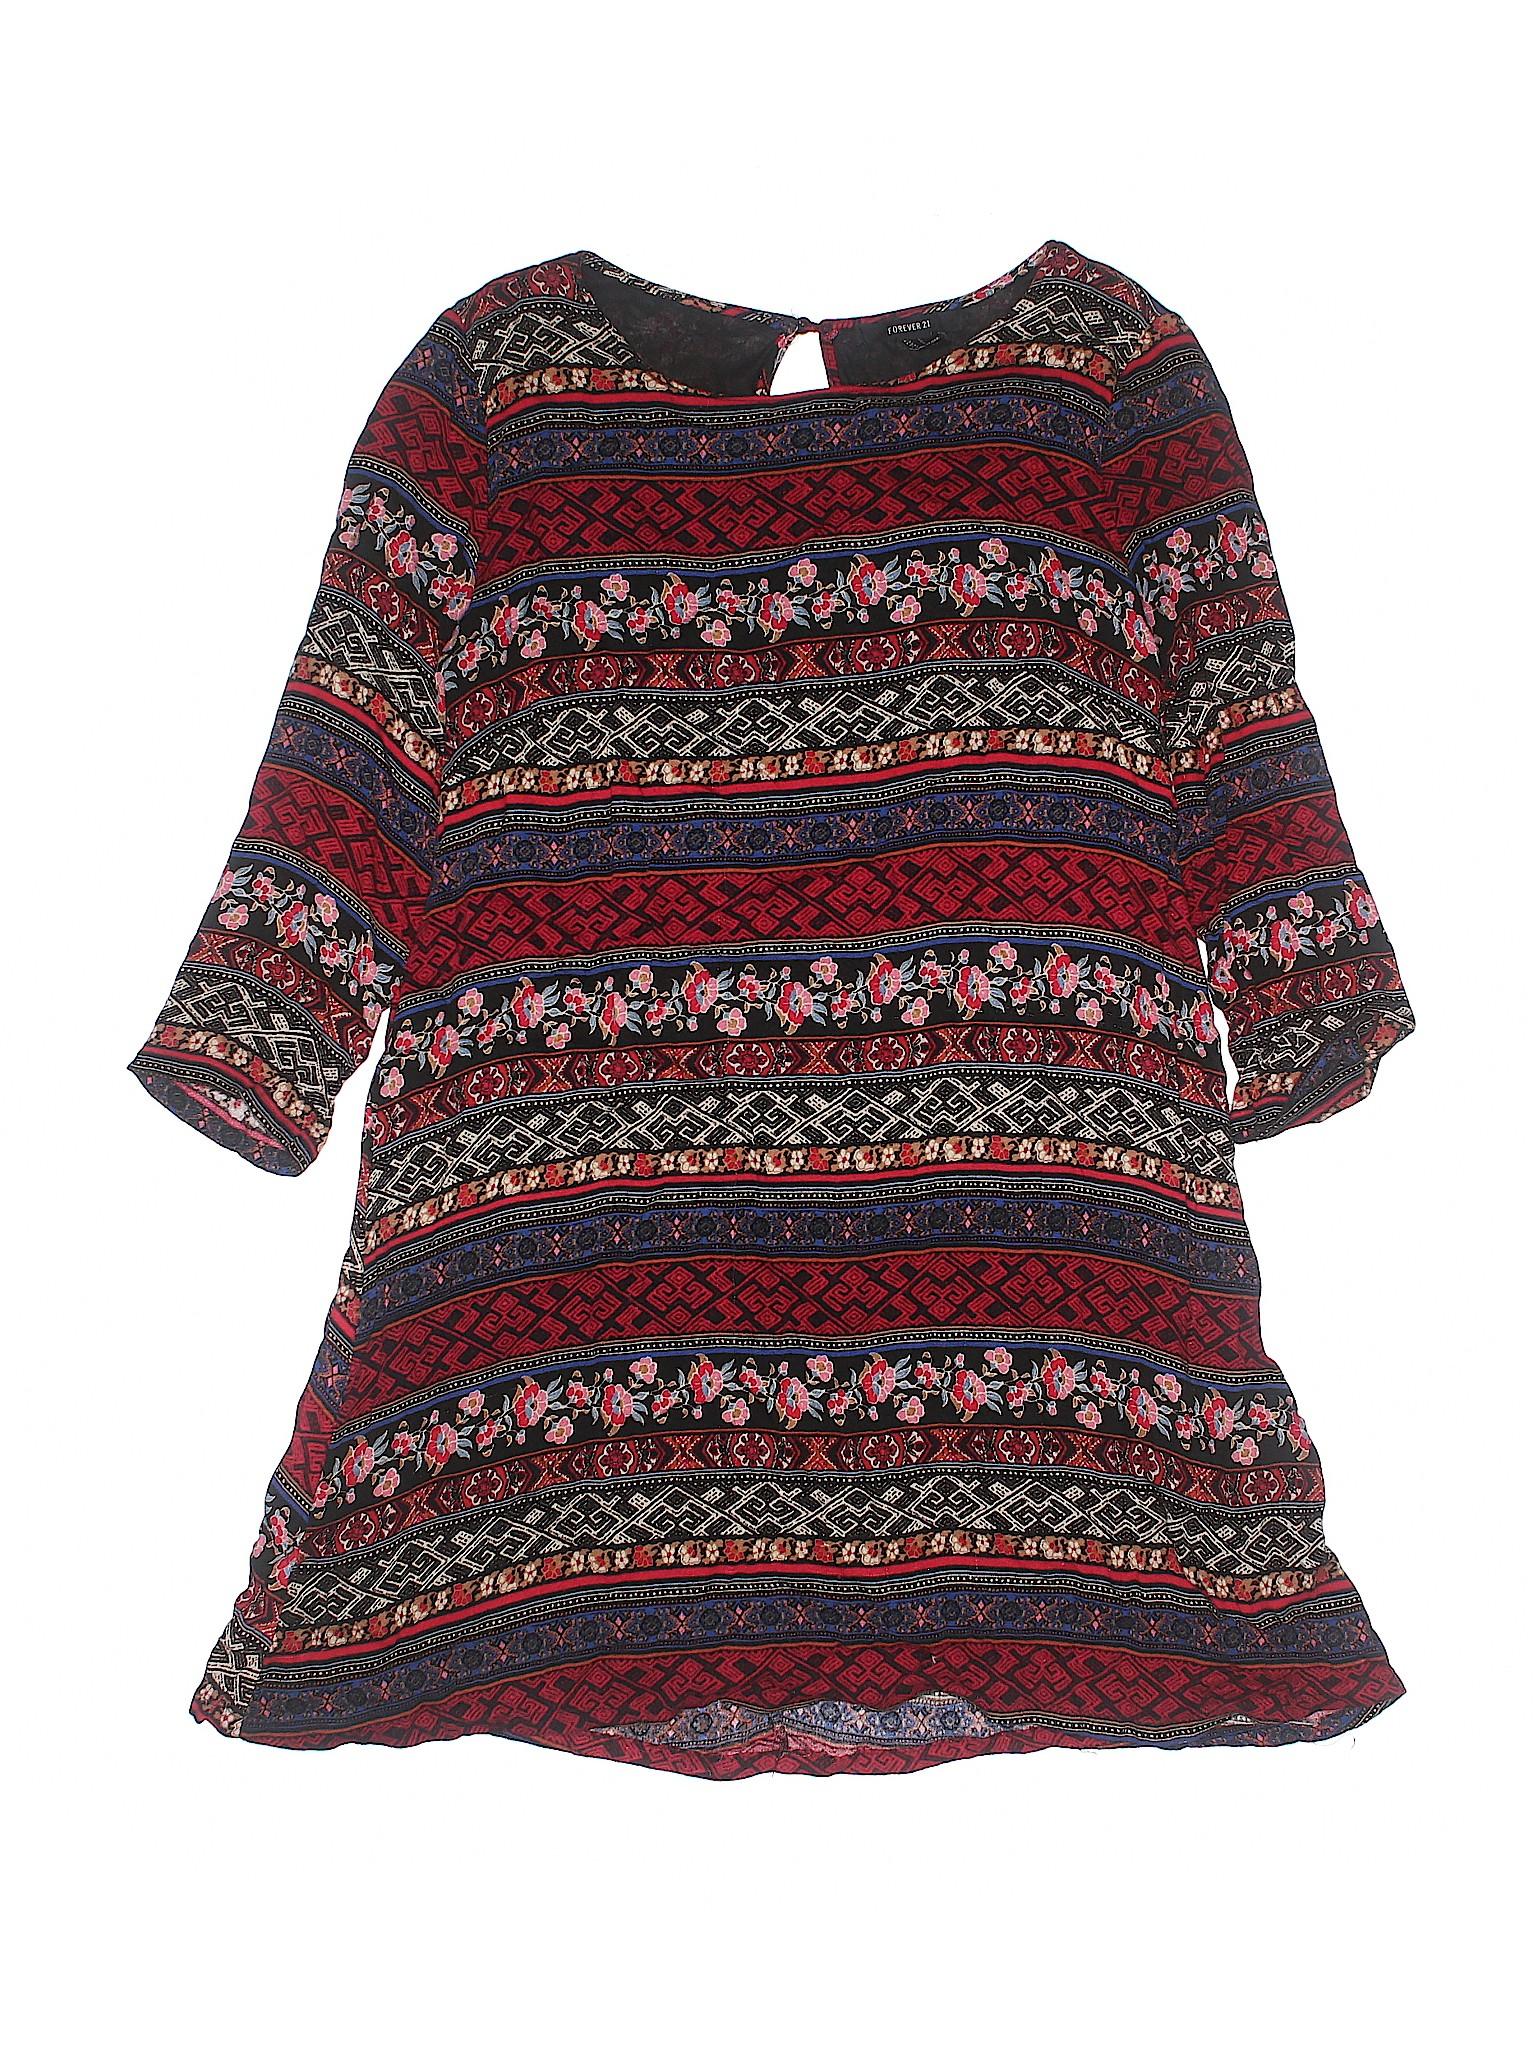 Boutique 21 Dress Casual winter Forever rqBOr